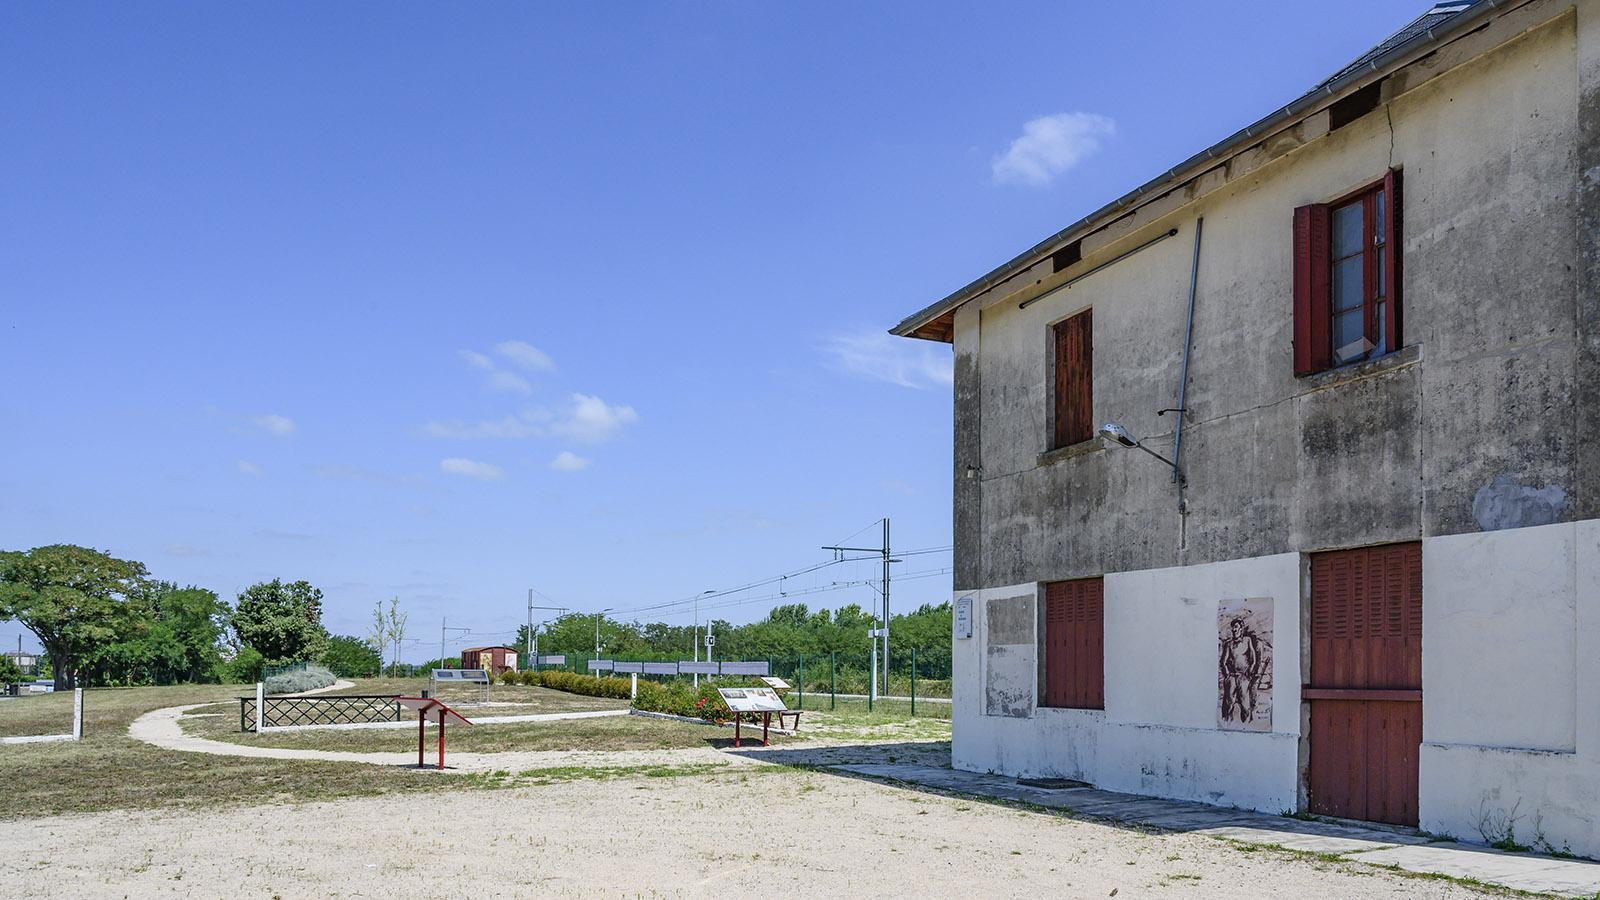 Die Gedenkstätte am Bahnhof. Foto: Hilke Maunder